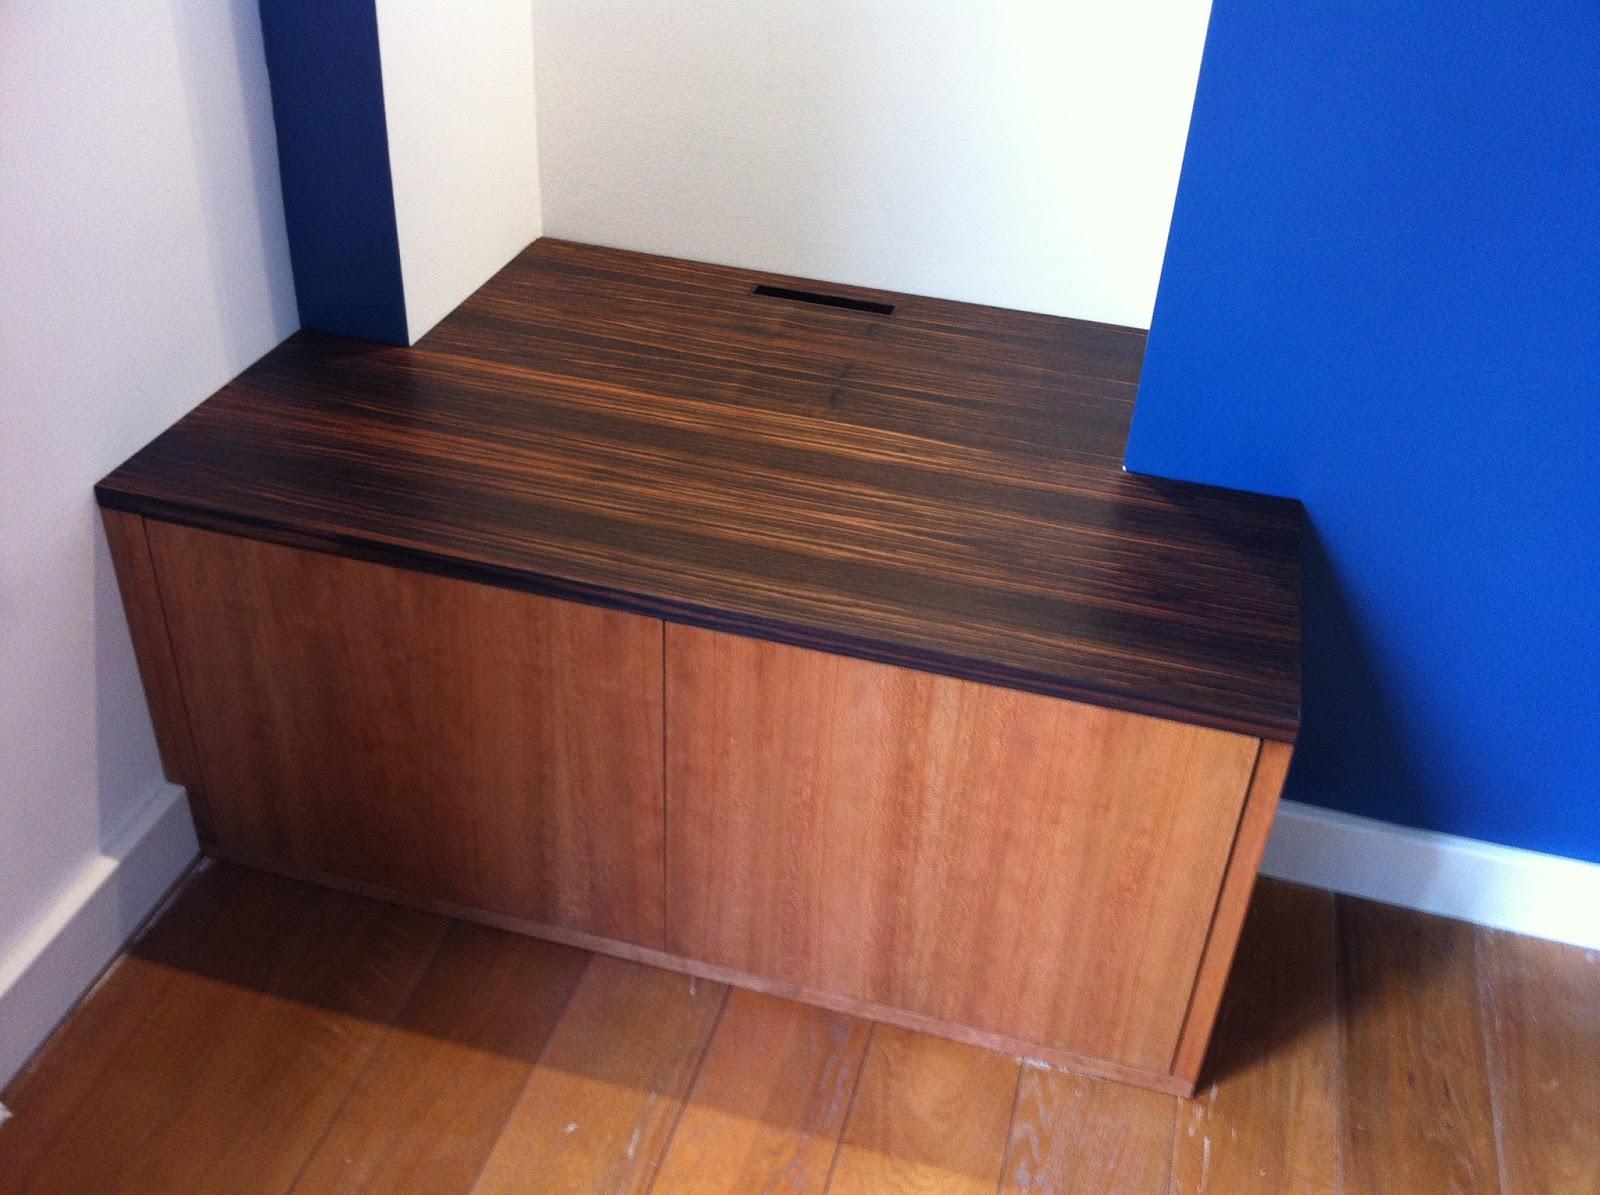 labo voluptas eb nisterie meuble bas de rangement hi fi. Black Bedroom Furniture Sets. Home Design Ideas